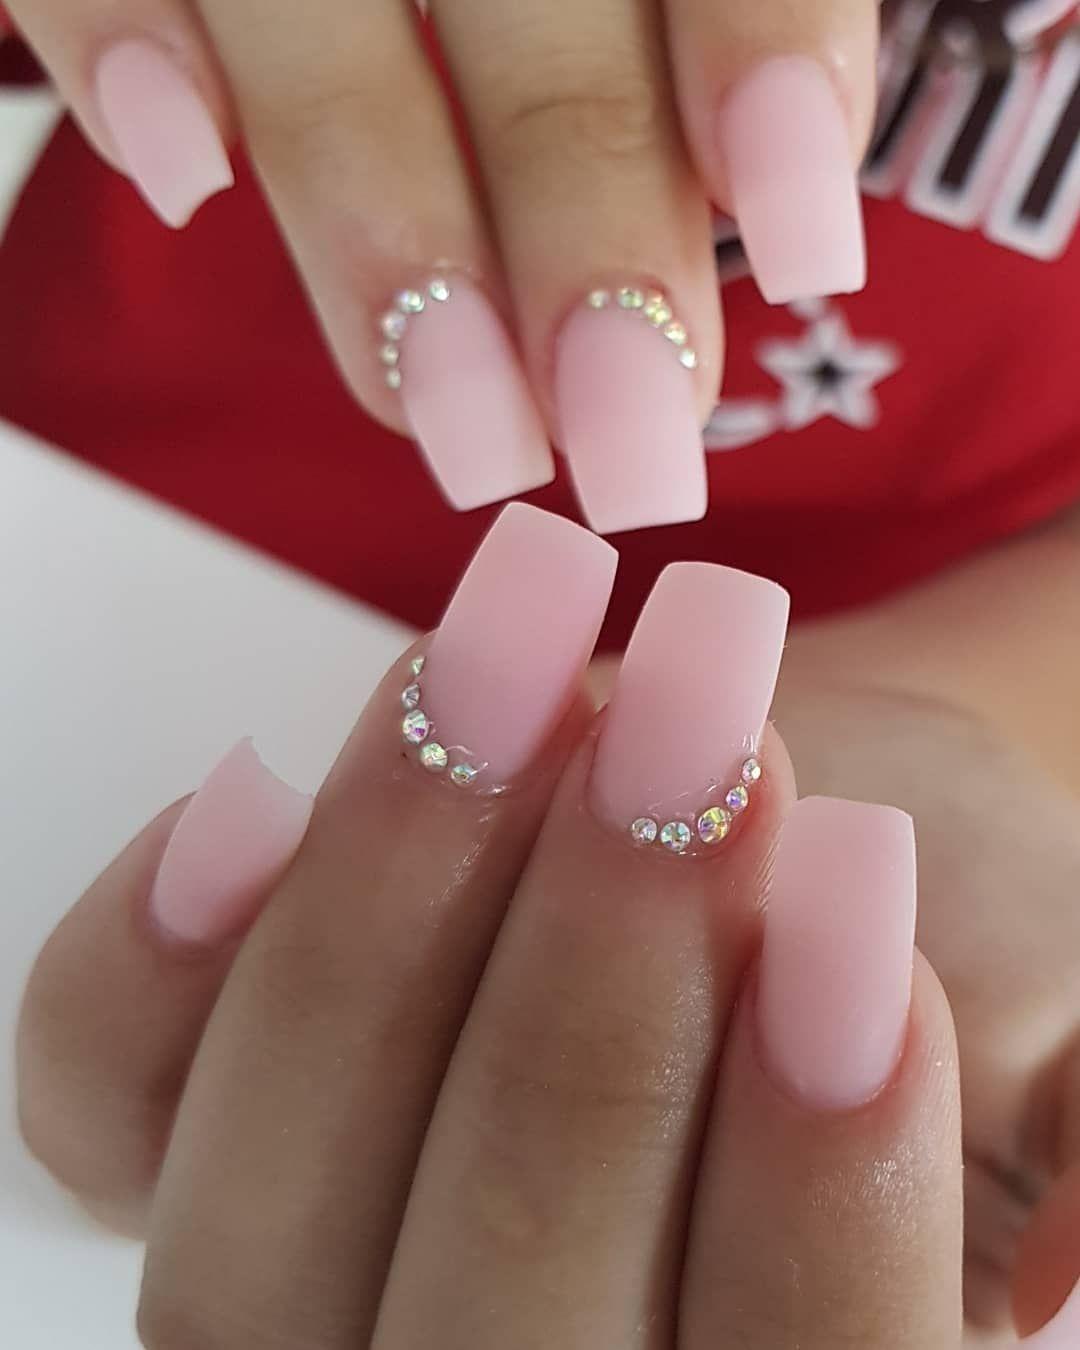 54 Nails Pink Nail Art Designs For Girls In Spring And Summer With Images Pink Nail Art Designs Pink Nail Art Squoval Nails